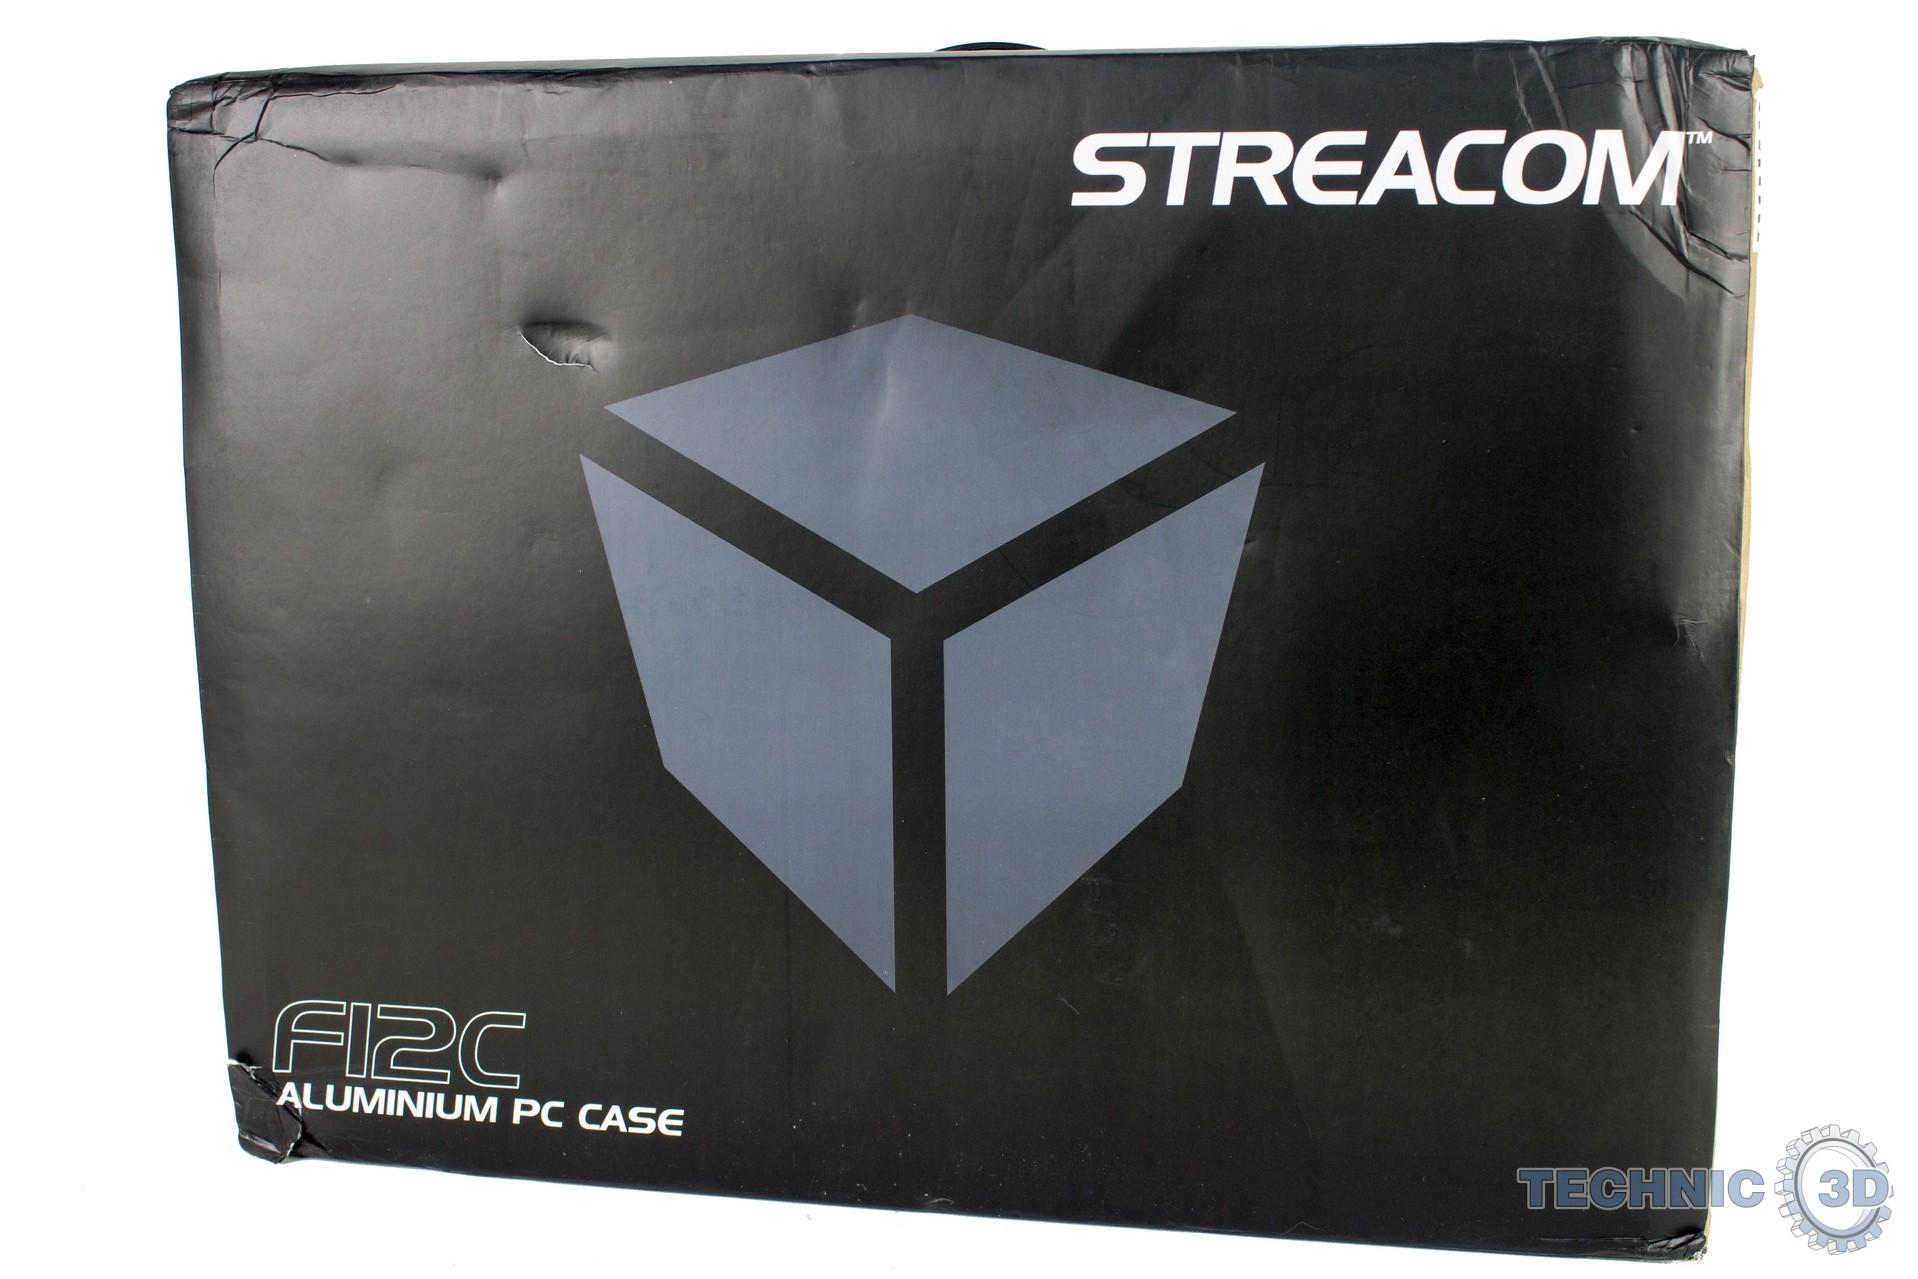 streacom f12c gehäuse im test   review   technic3d, Wohnzimmer